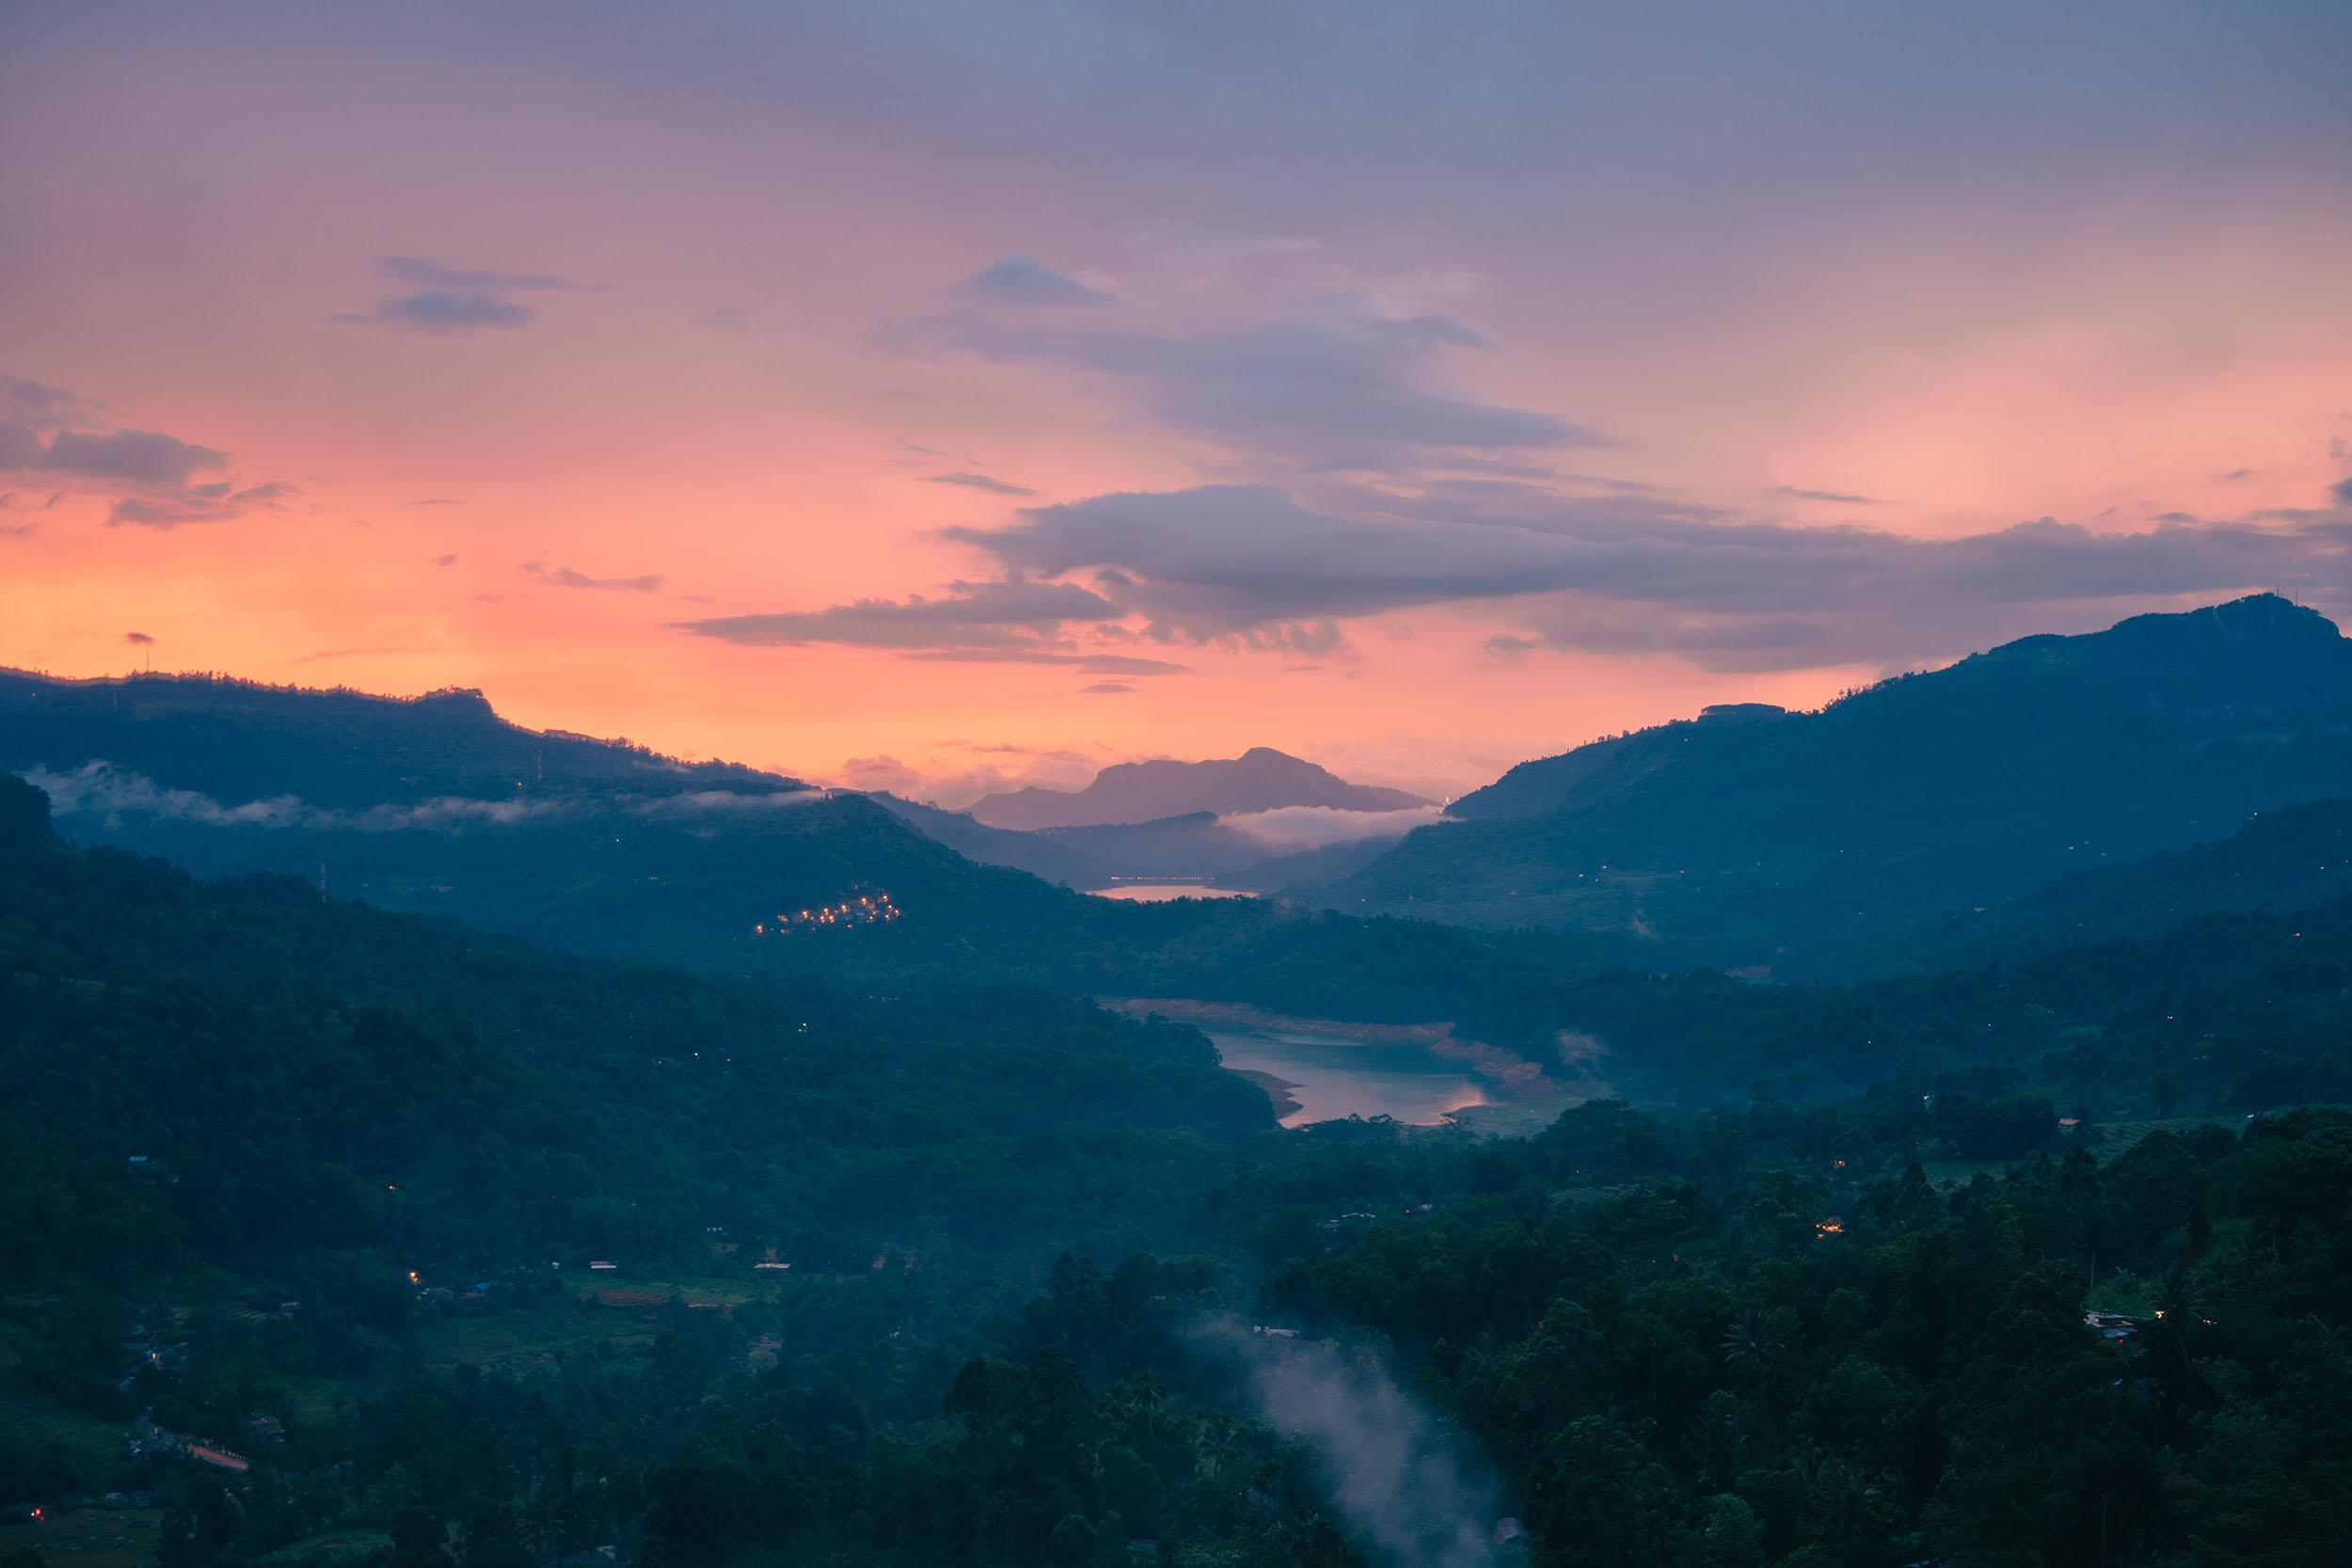 Beautiful sunsets over the hills in Ramboda, Sri Lanka